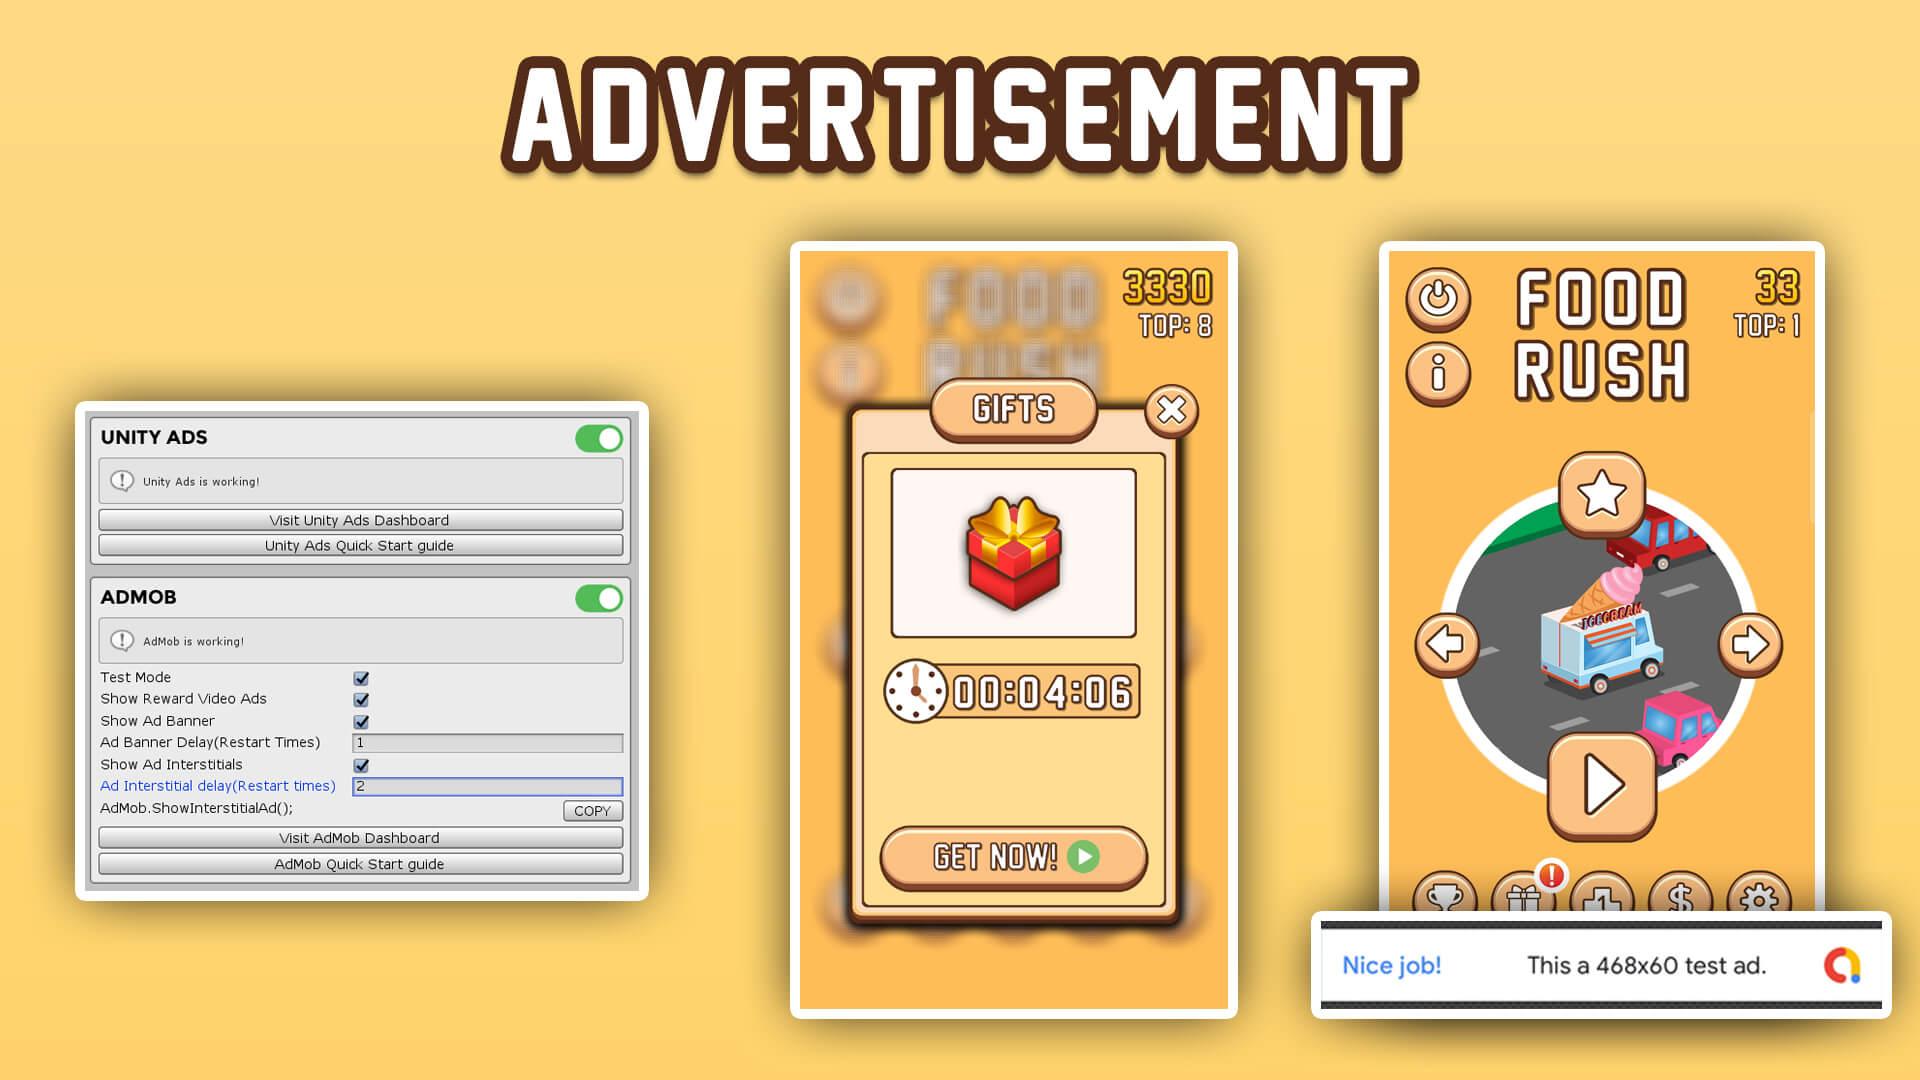 Buy Food Rush App source code - Sell My App